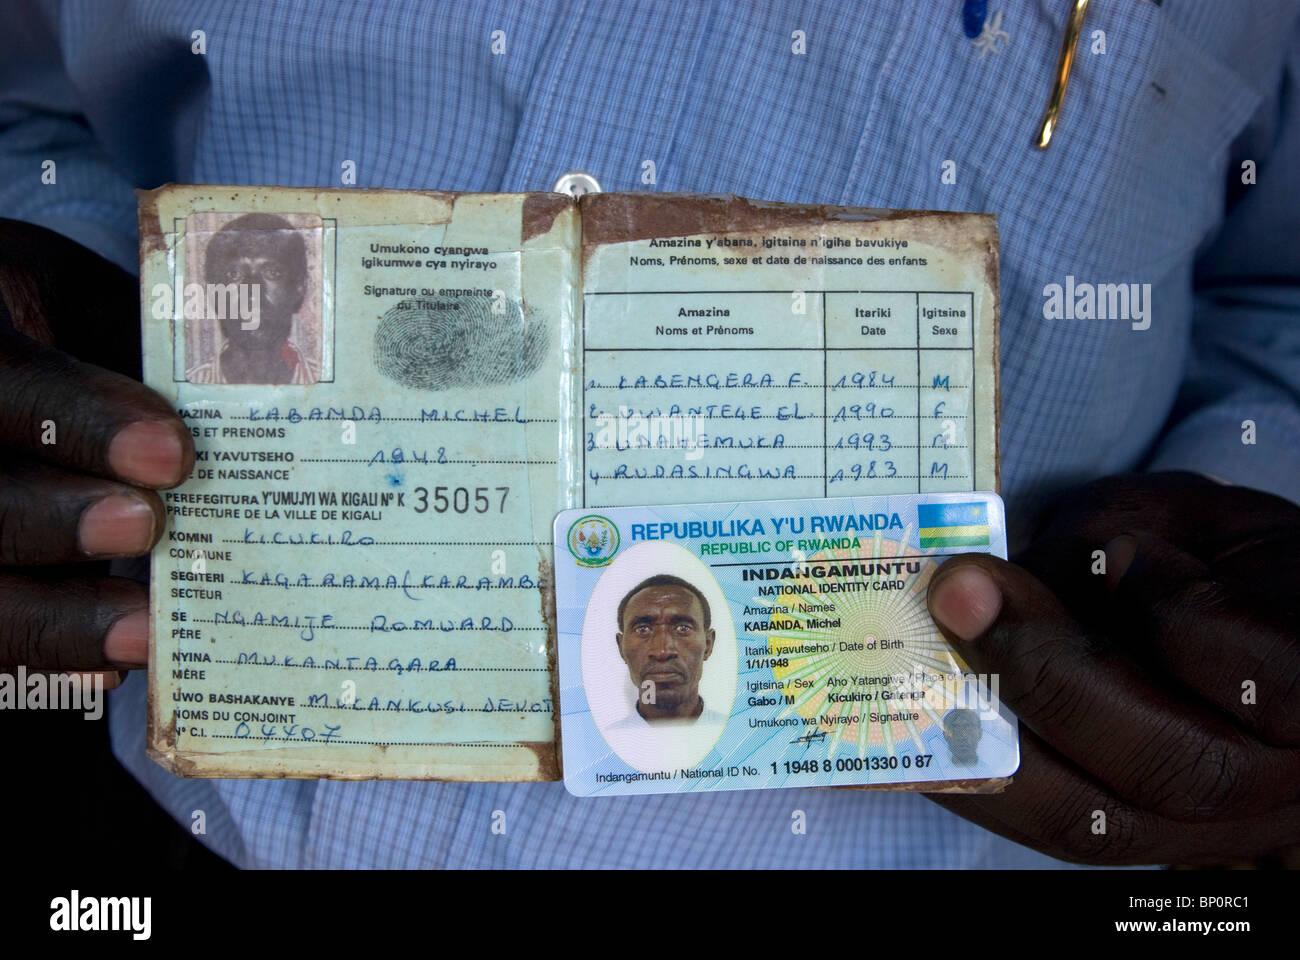 Rwanda, man showing Identity Cards - Stock Image